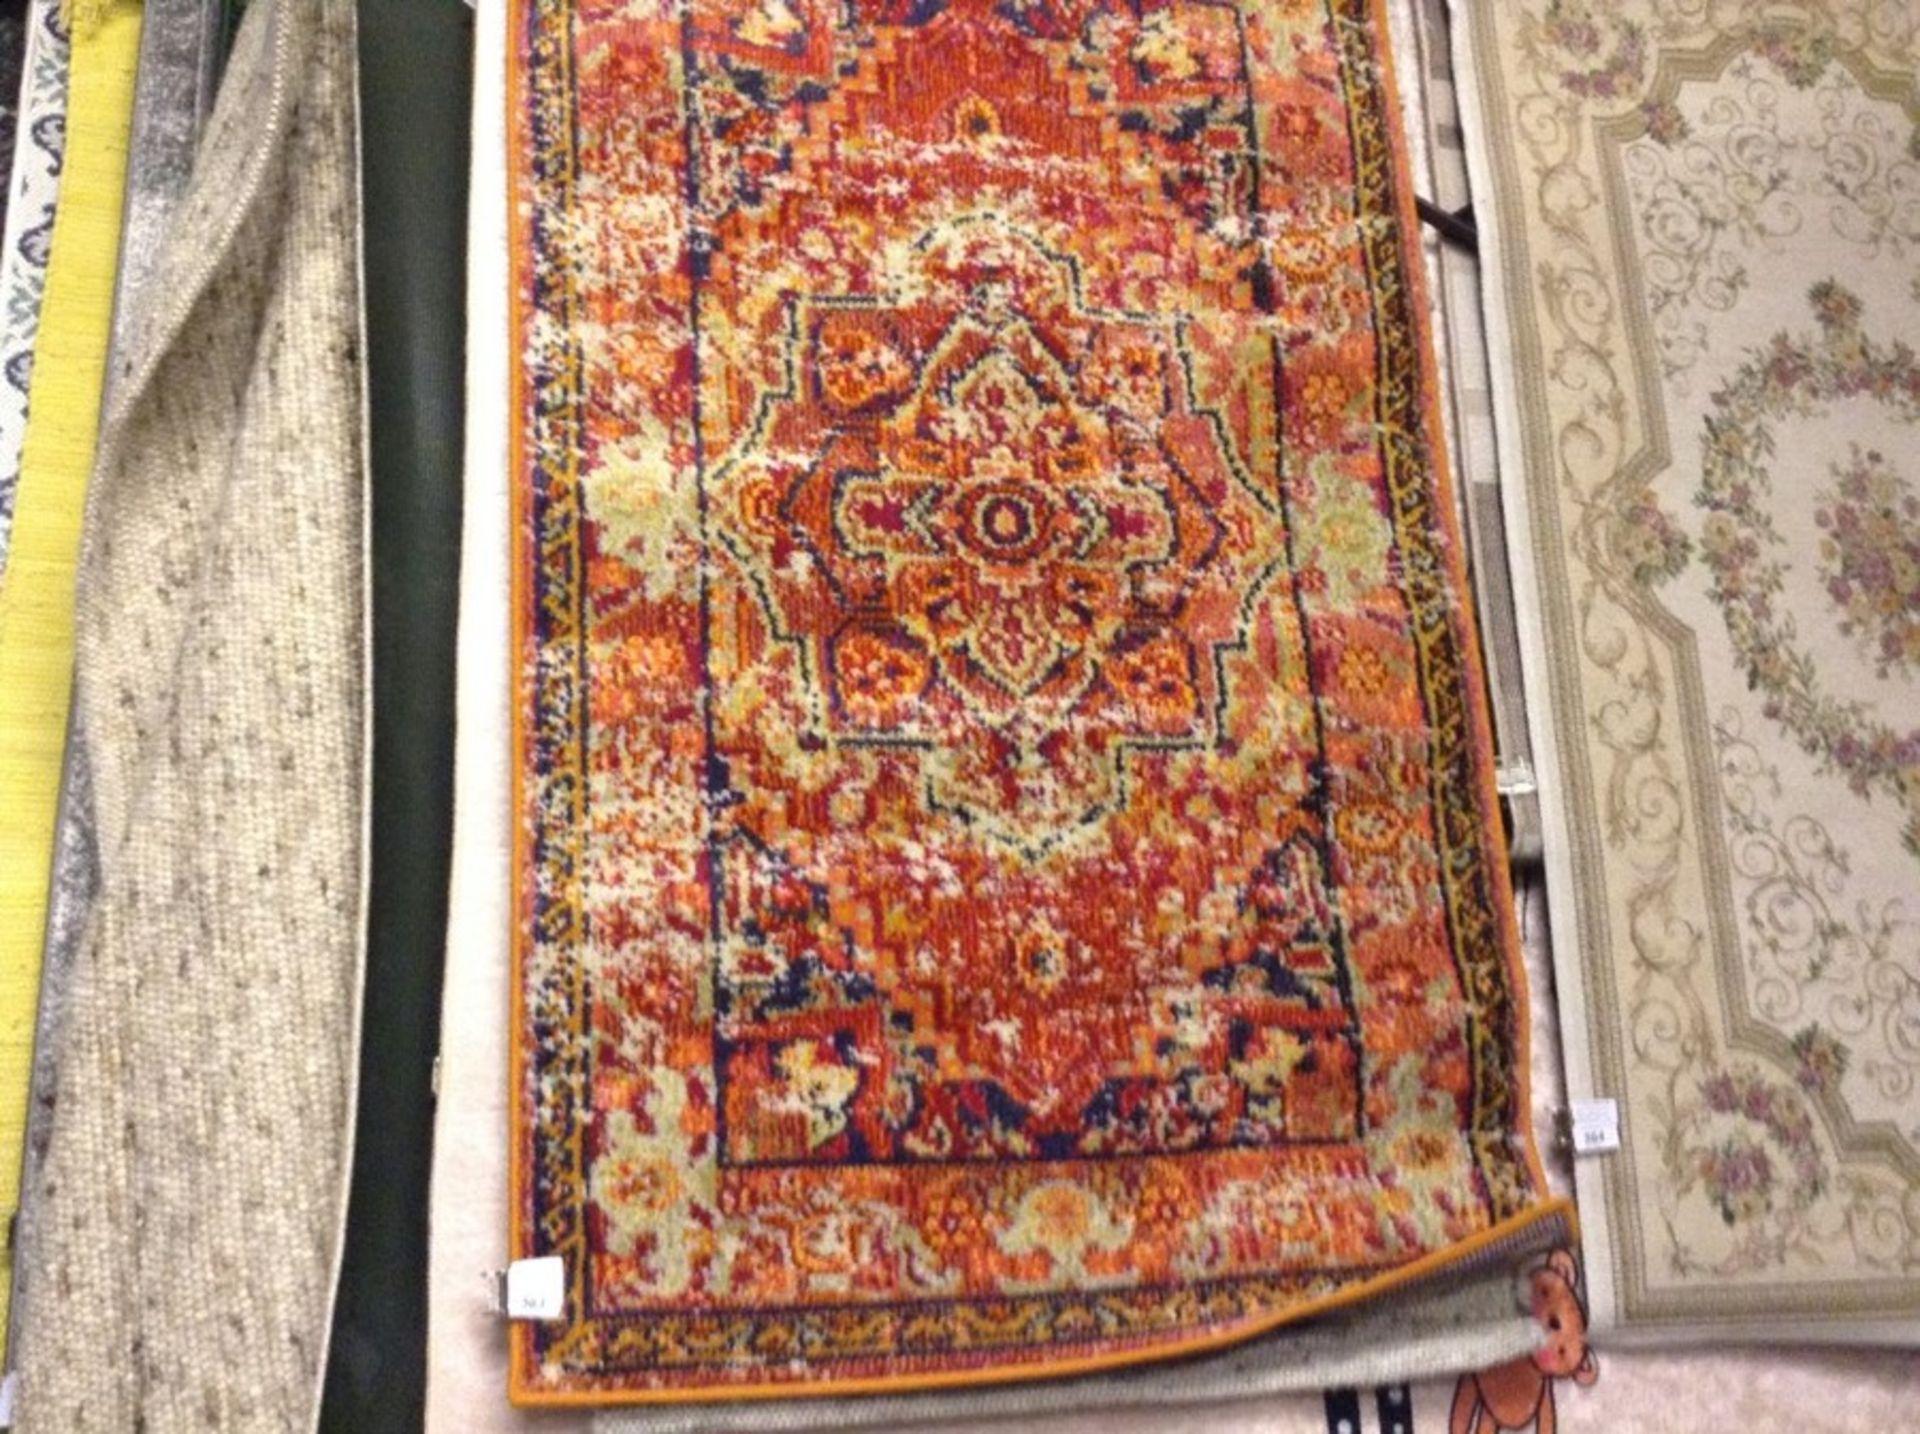 Mackenzie Orange Rug Rug Size: Rectangle 91 x 152cm (HL7 - 4/15 -BUNR1374.18877389)